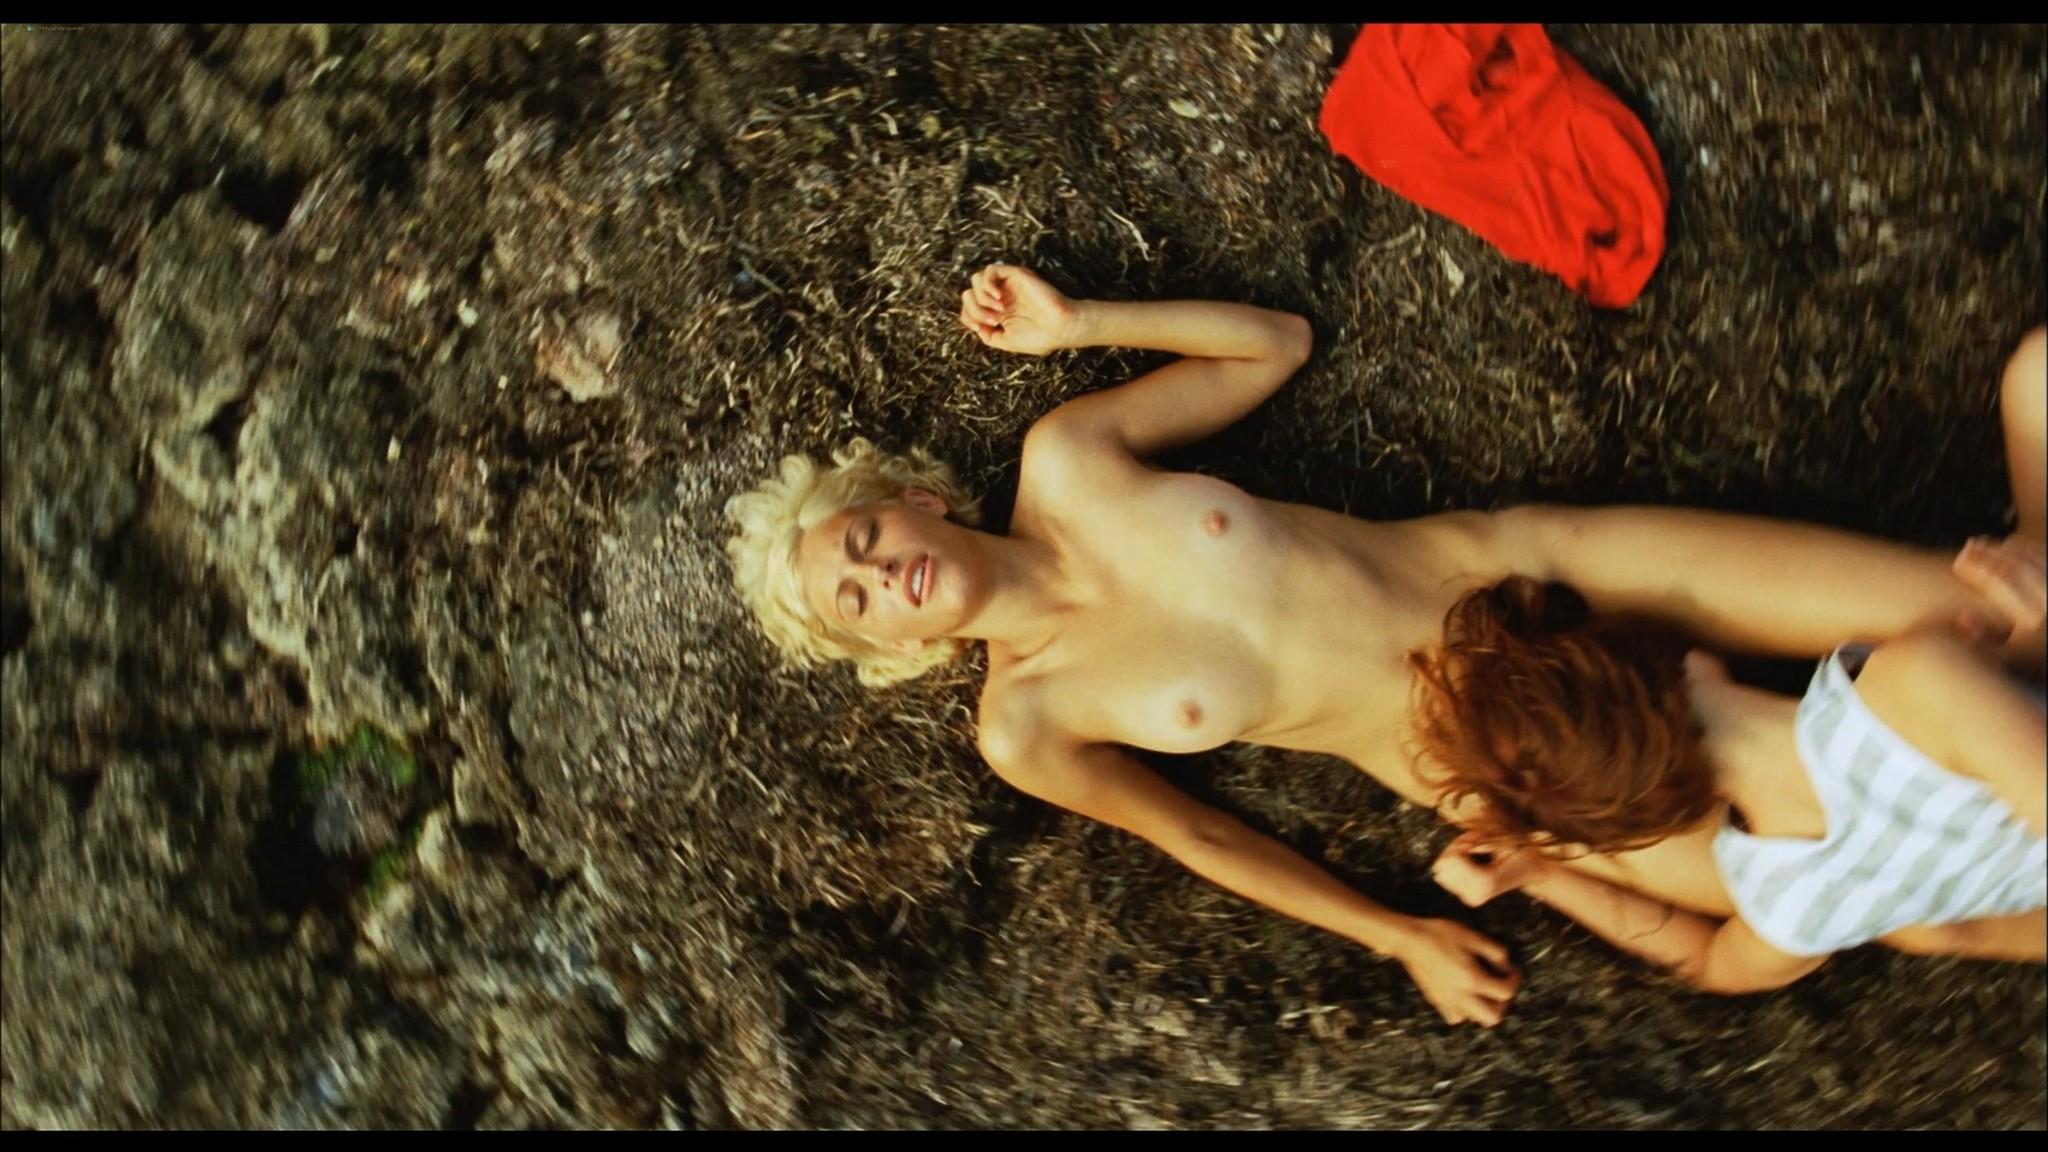 Avalon Barrie nude and Lyudmila Shiryaeva nude full frontal Sappho 2008 HD 1080p BluRay REMUX 12